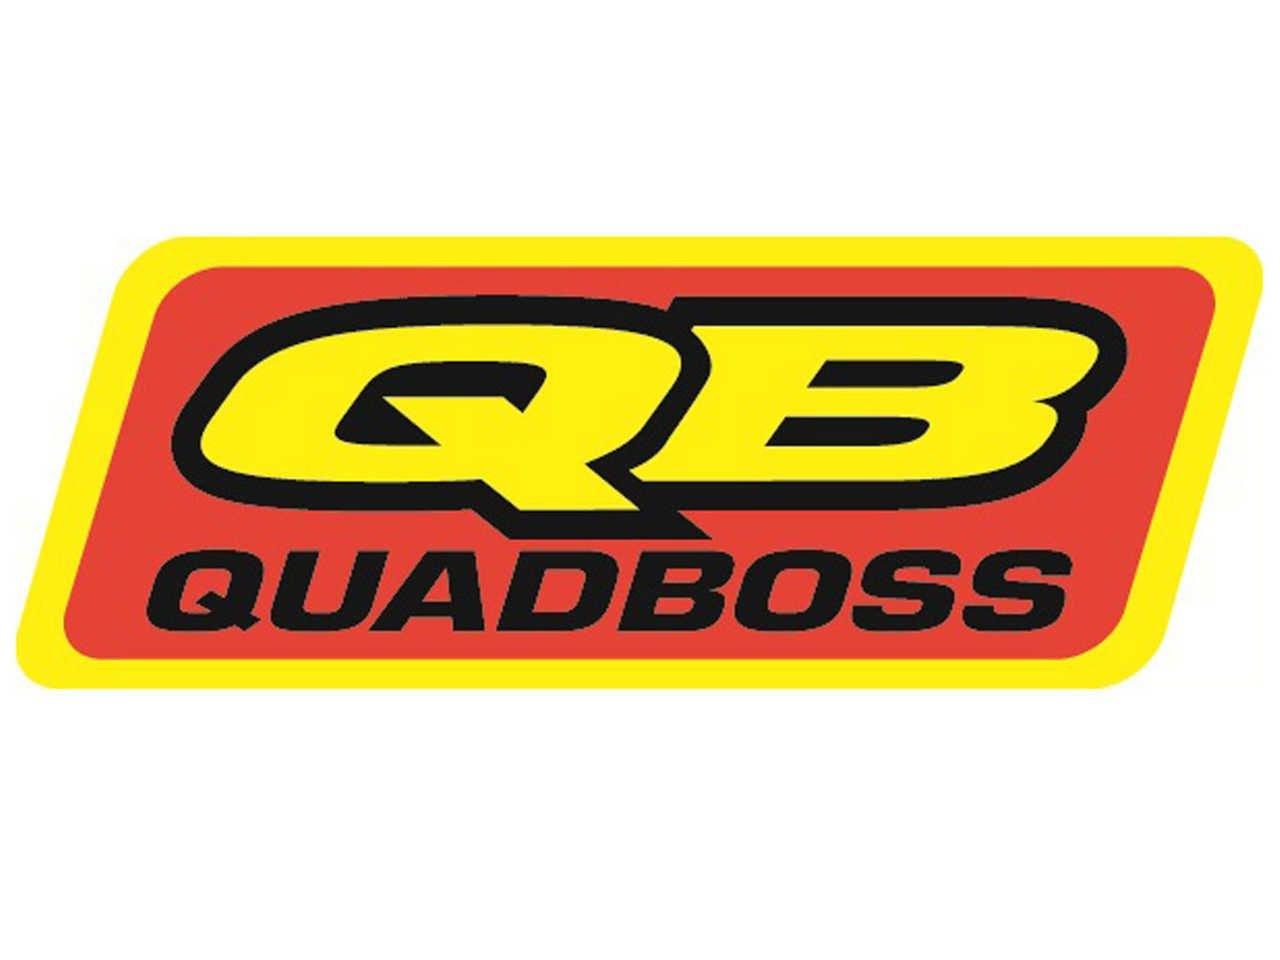 Quadboss QBT672 30X10R14 8-Ply Front/Rear Tire